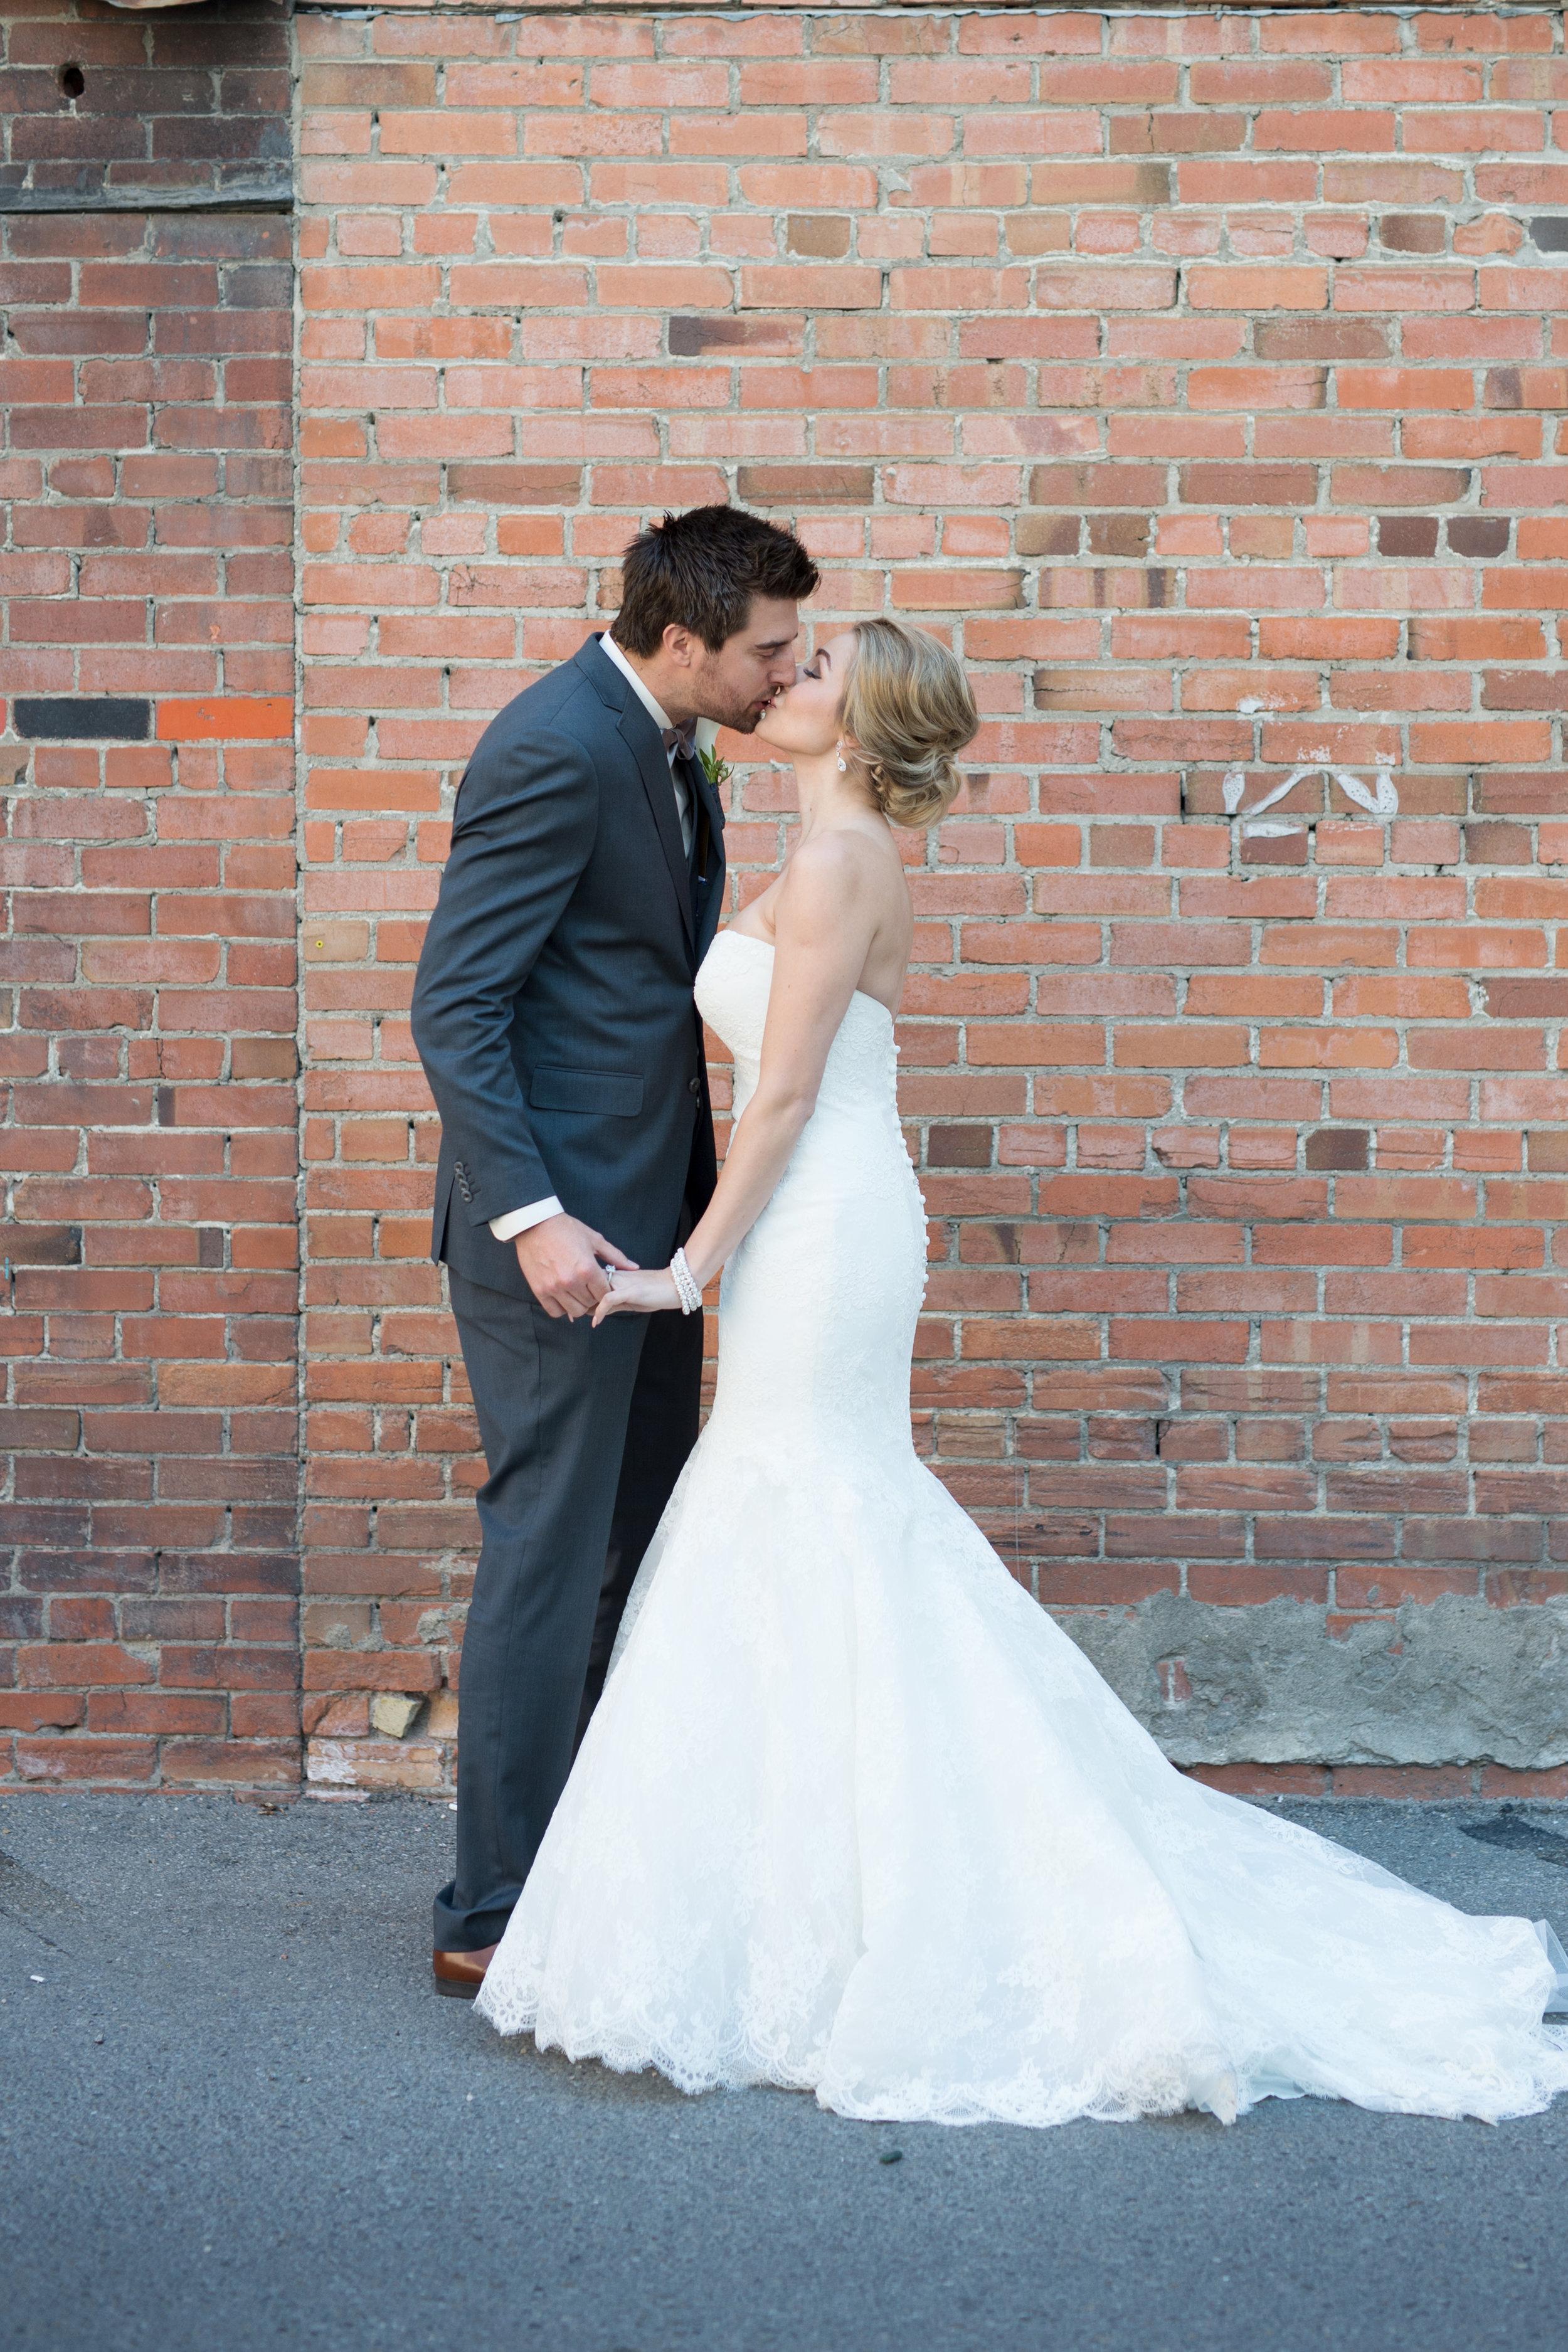 Calgary_Wedding_Photographer_Sanja_Scott_2016_HR 0209.jpg